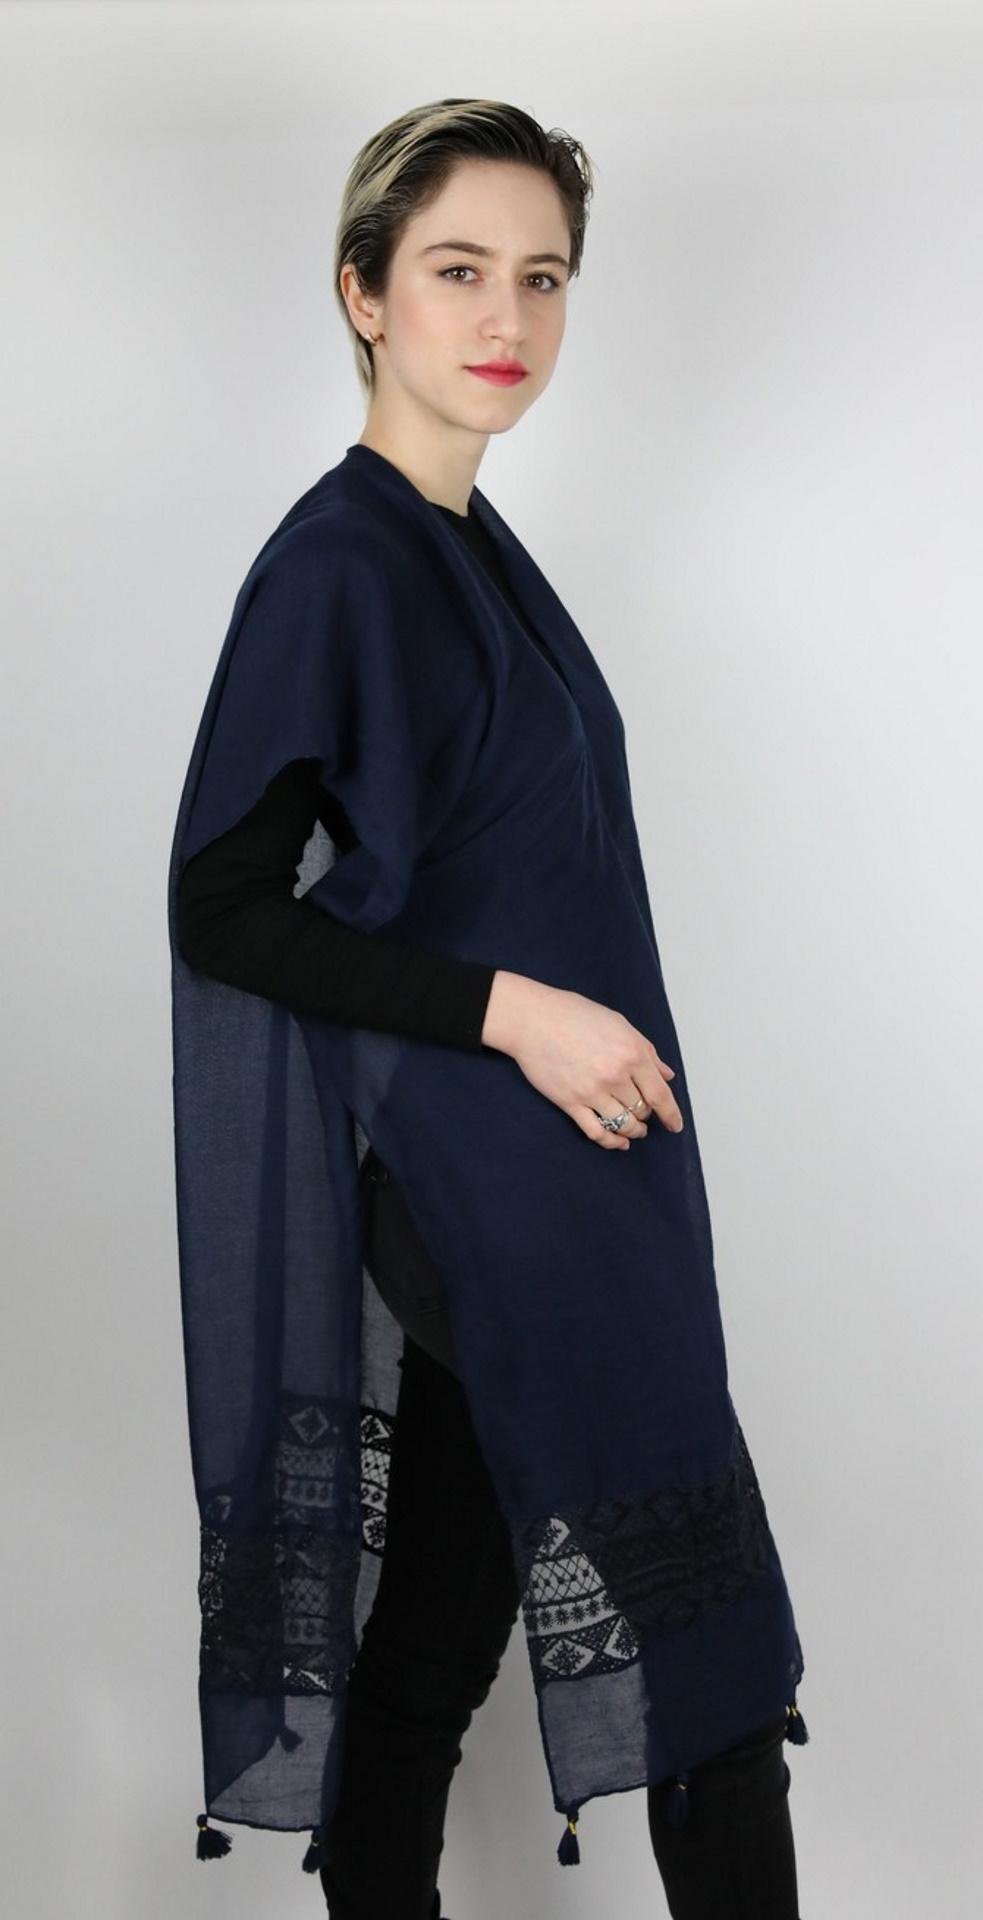 CLOTHES176 STOLA DONNA FOULARD CARDIGAN COPRISPALLE 3 1stAmerican elegante stola da donna foulard cardigan coprispalle